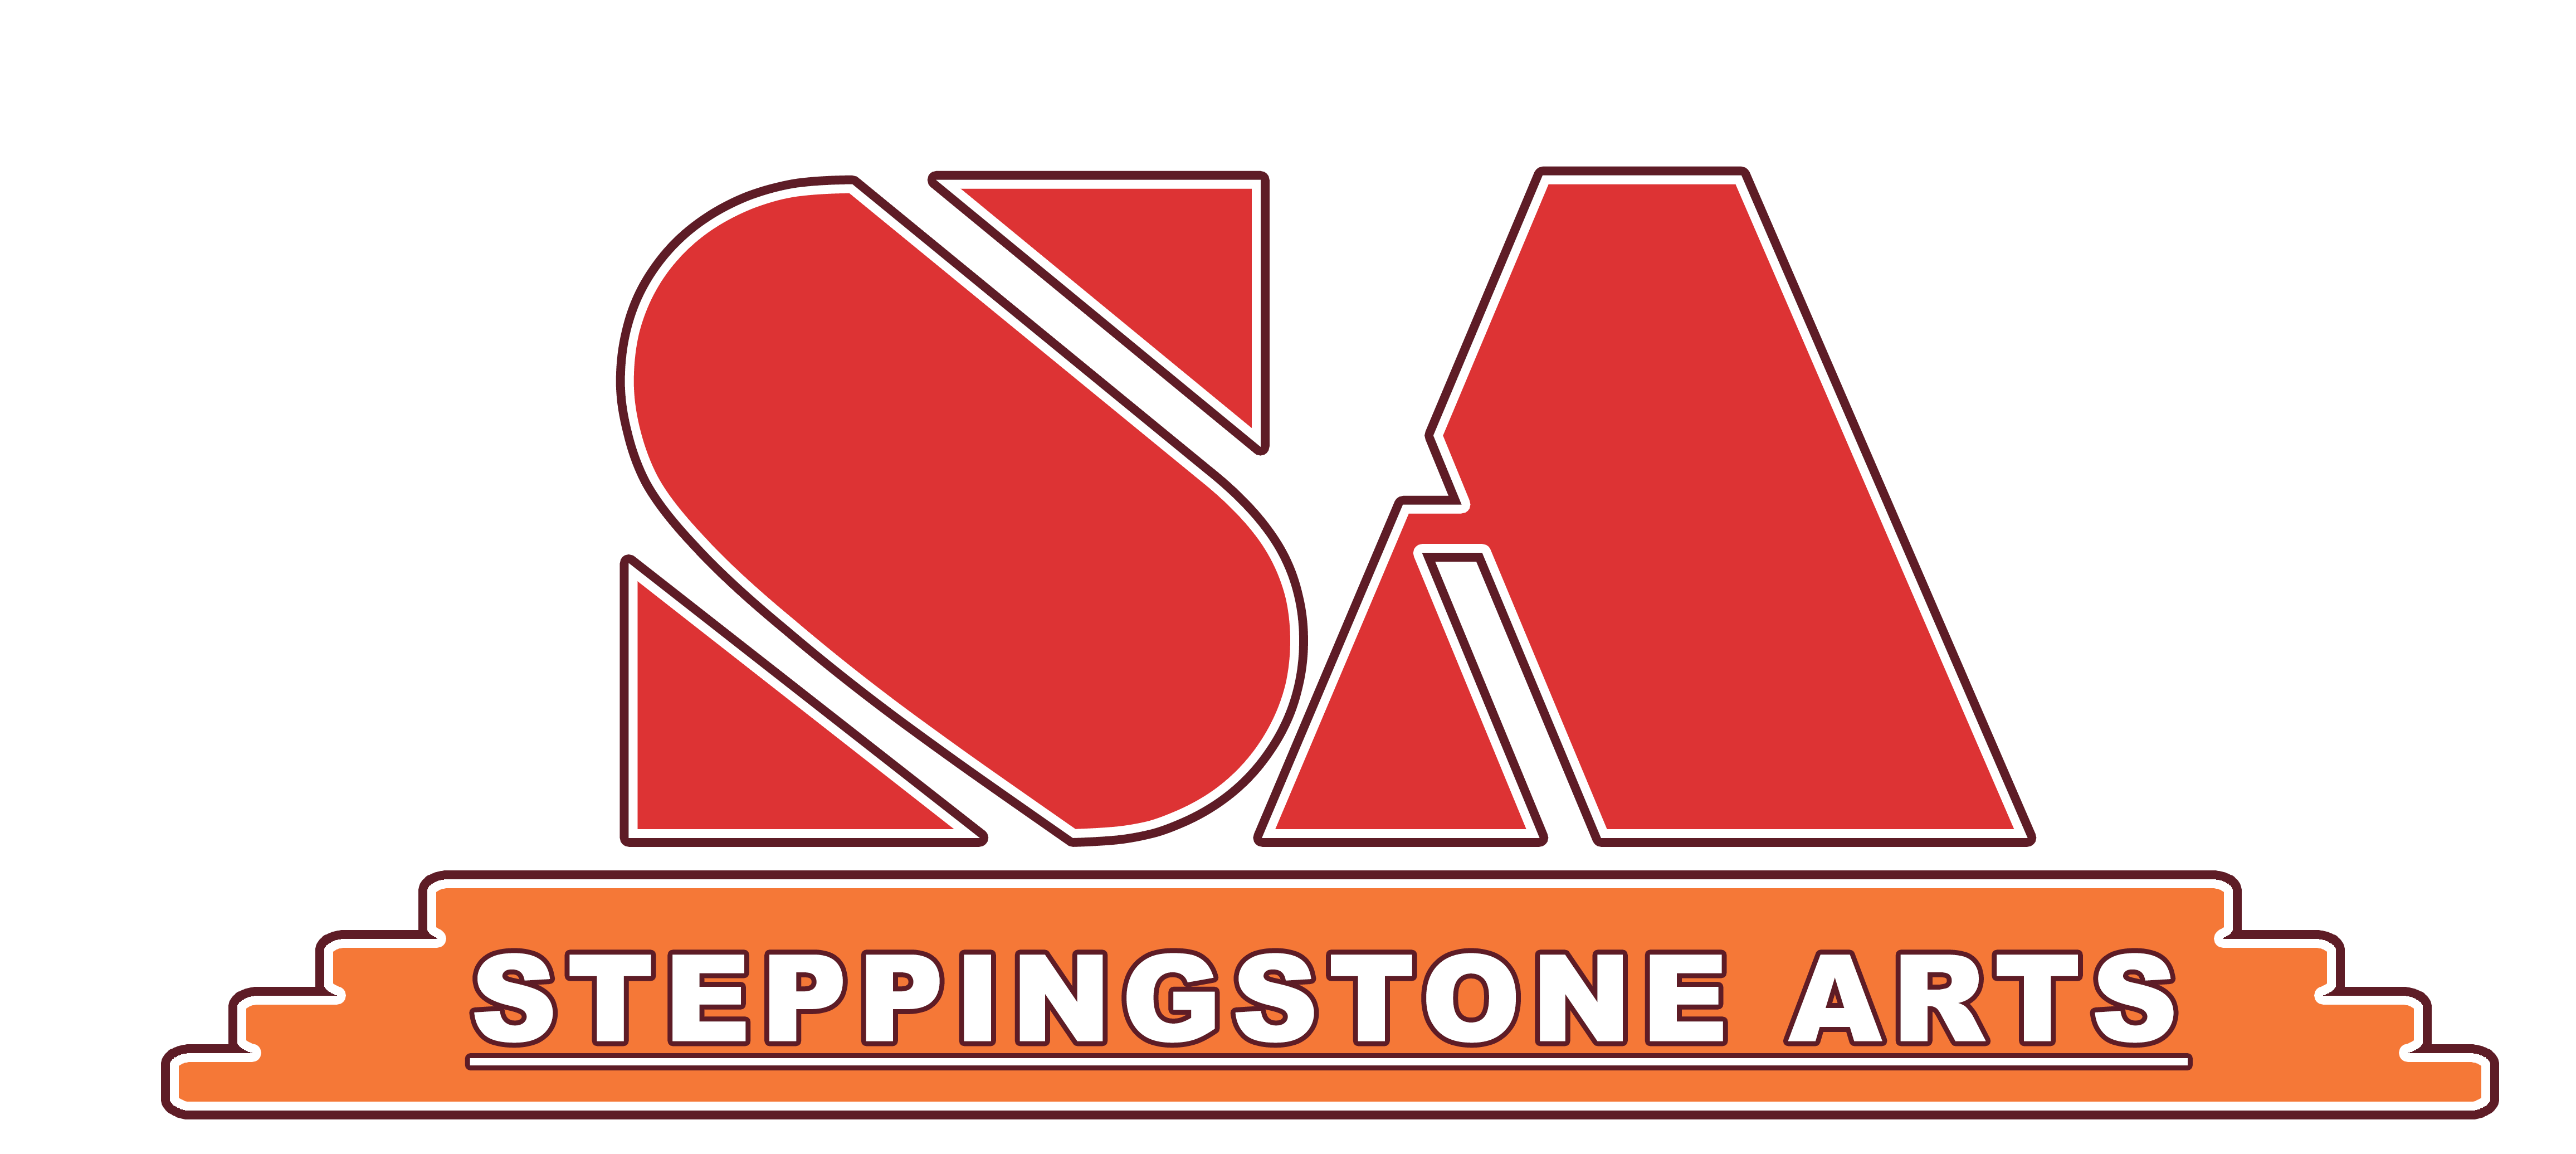 Steppingstone Arts LLC